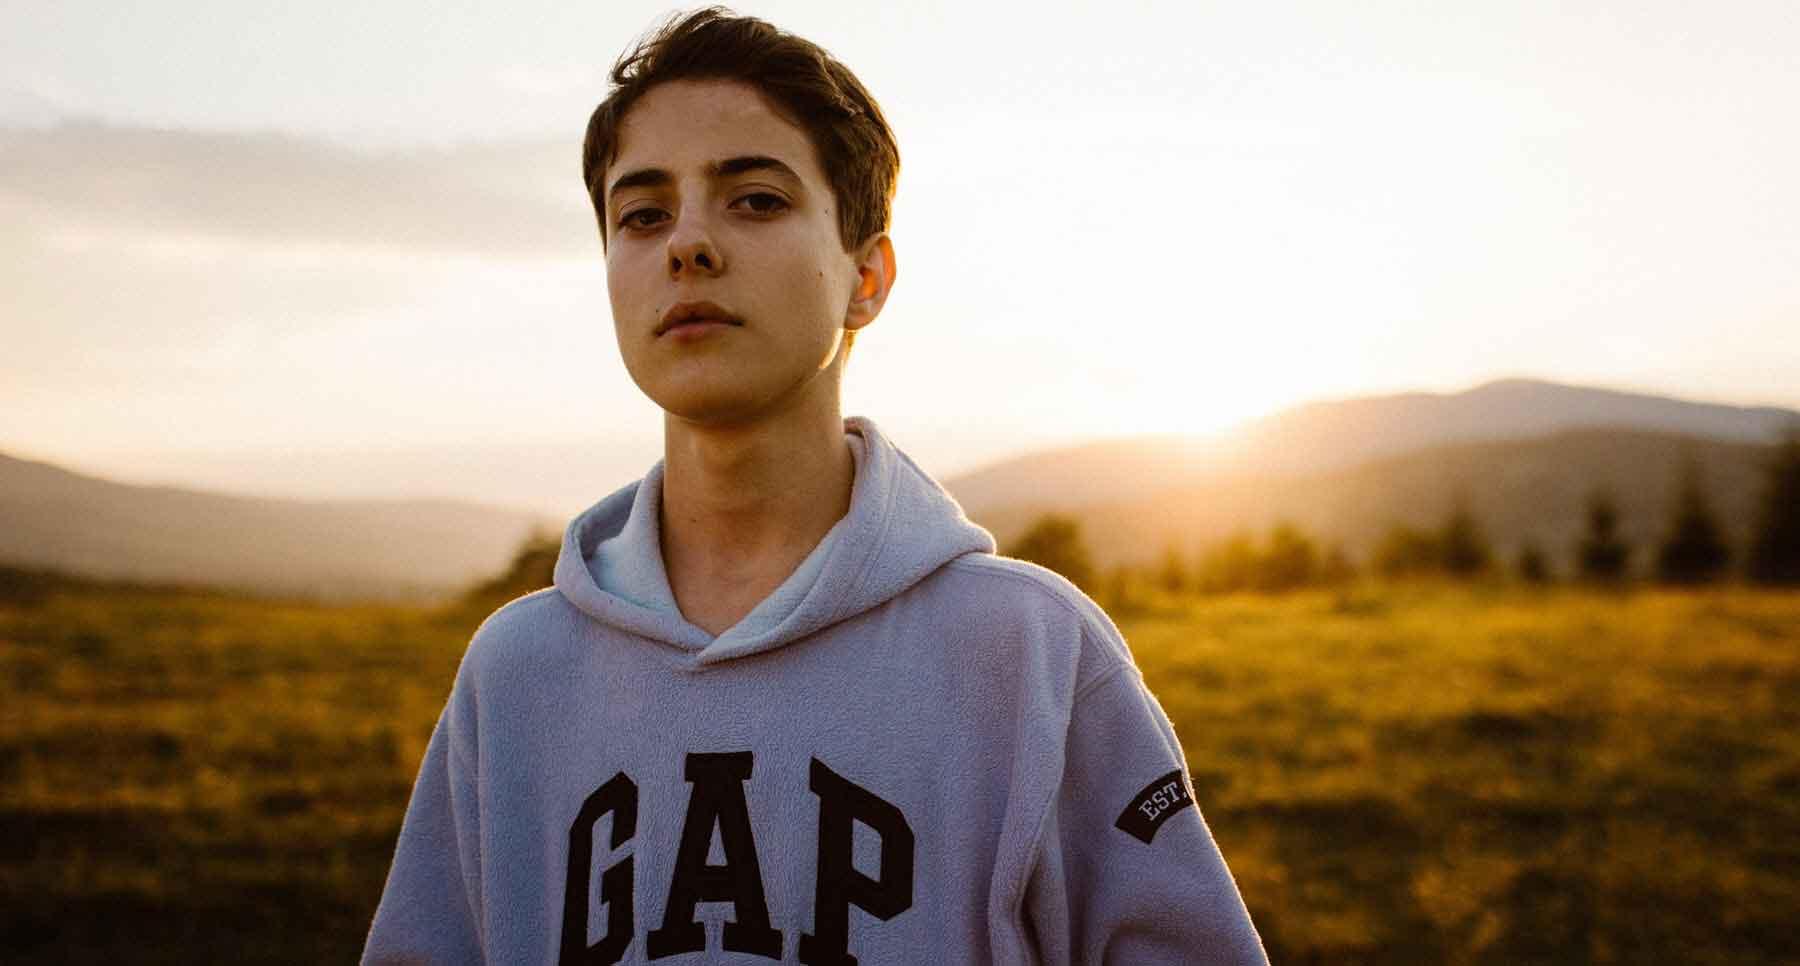 teen-boy-standing-outside-dad-abandoned-left-him